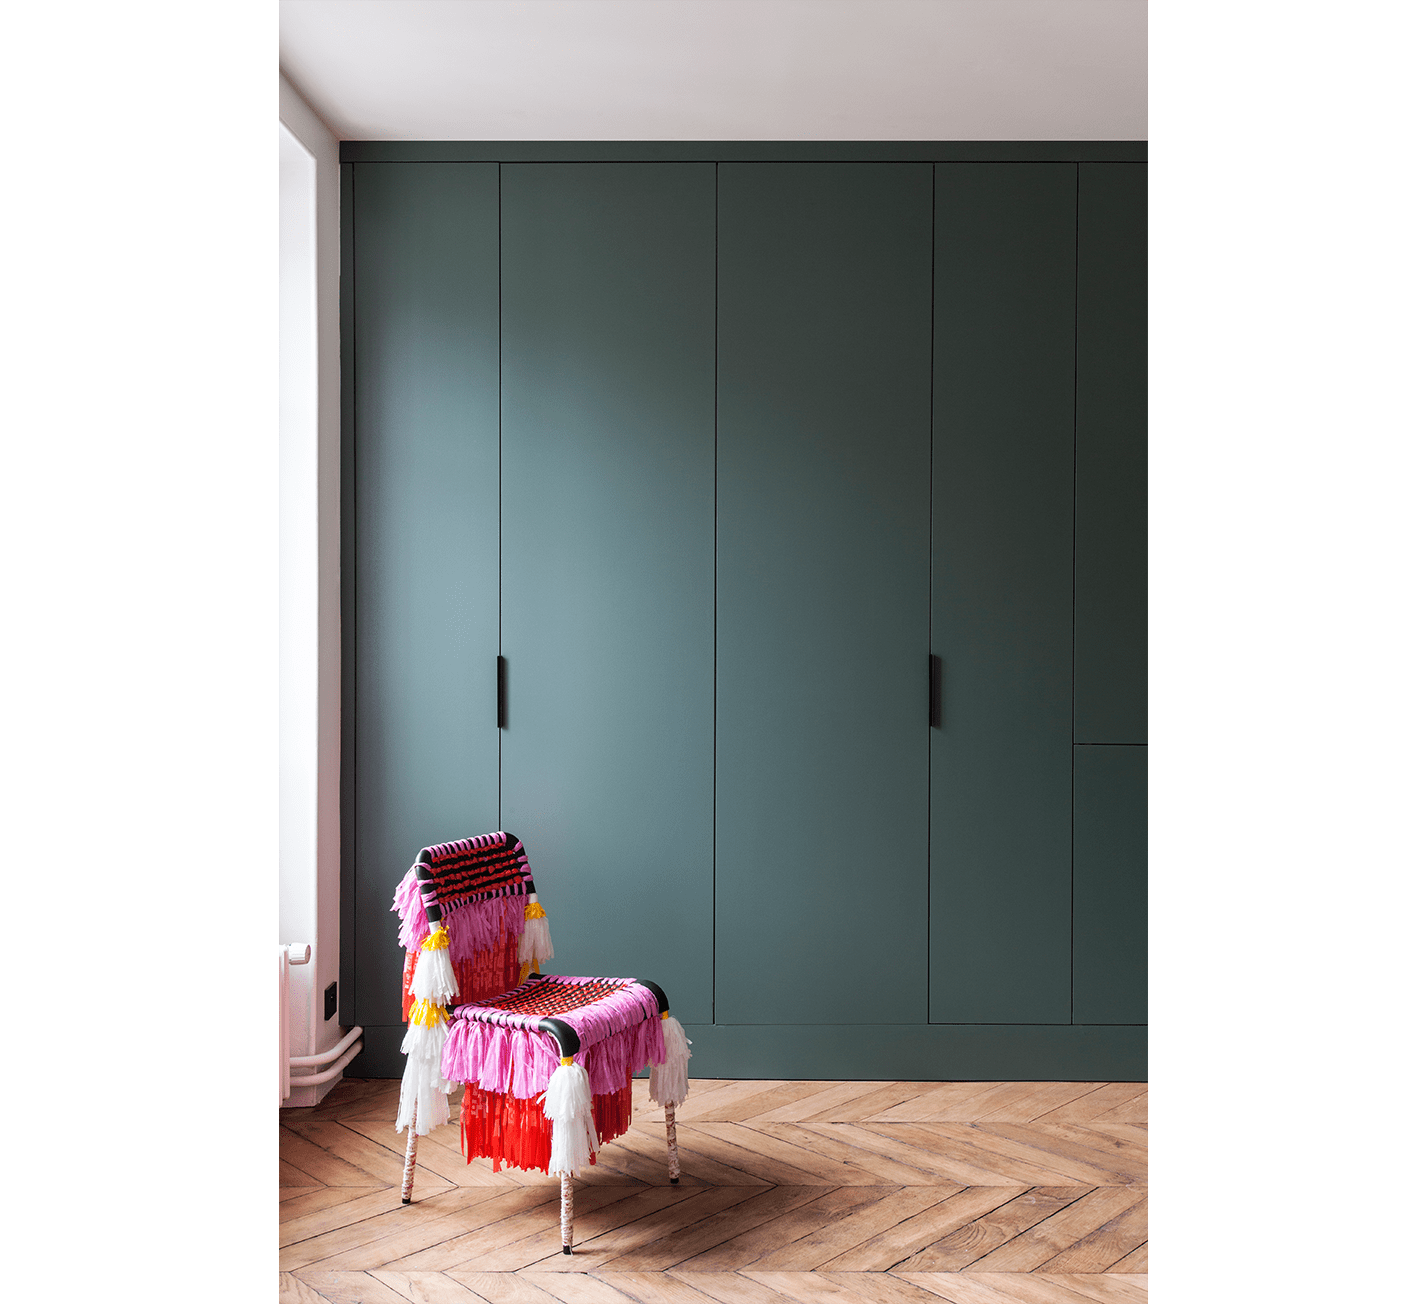 Projet-Jules-Cesar-Atelier-Steve-Pauline-Borgia-Architecte-interieur-03-min